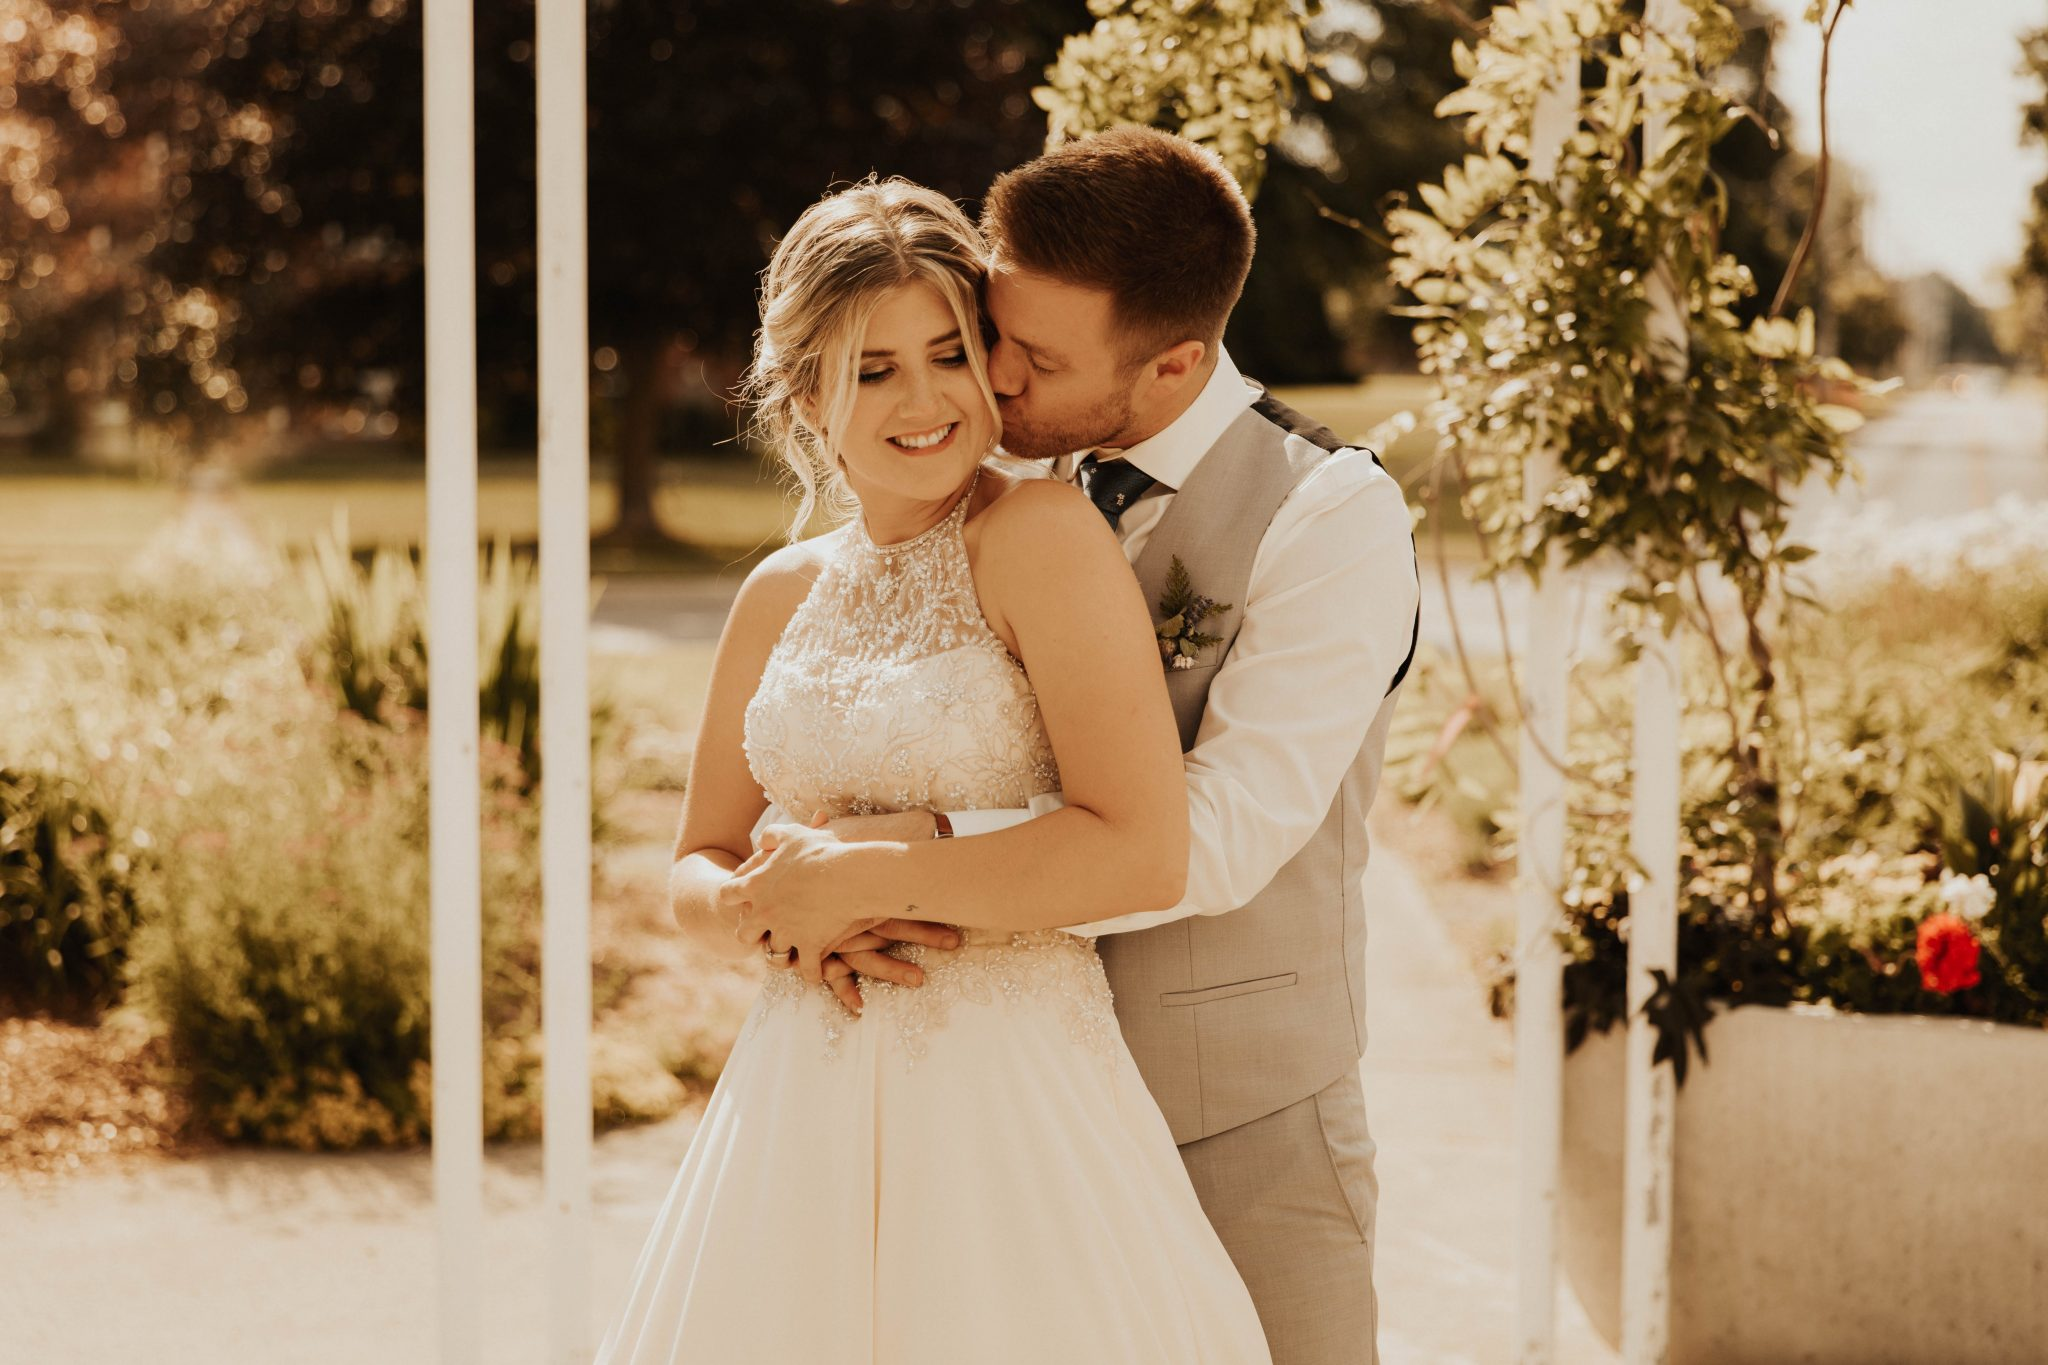 Stratford wedding photo locations